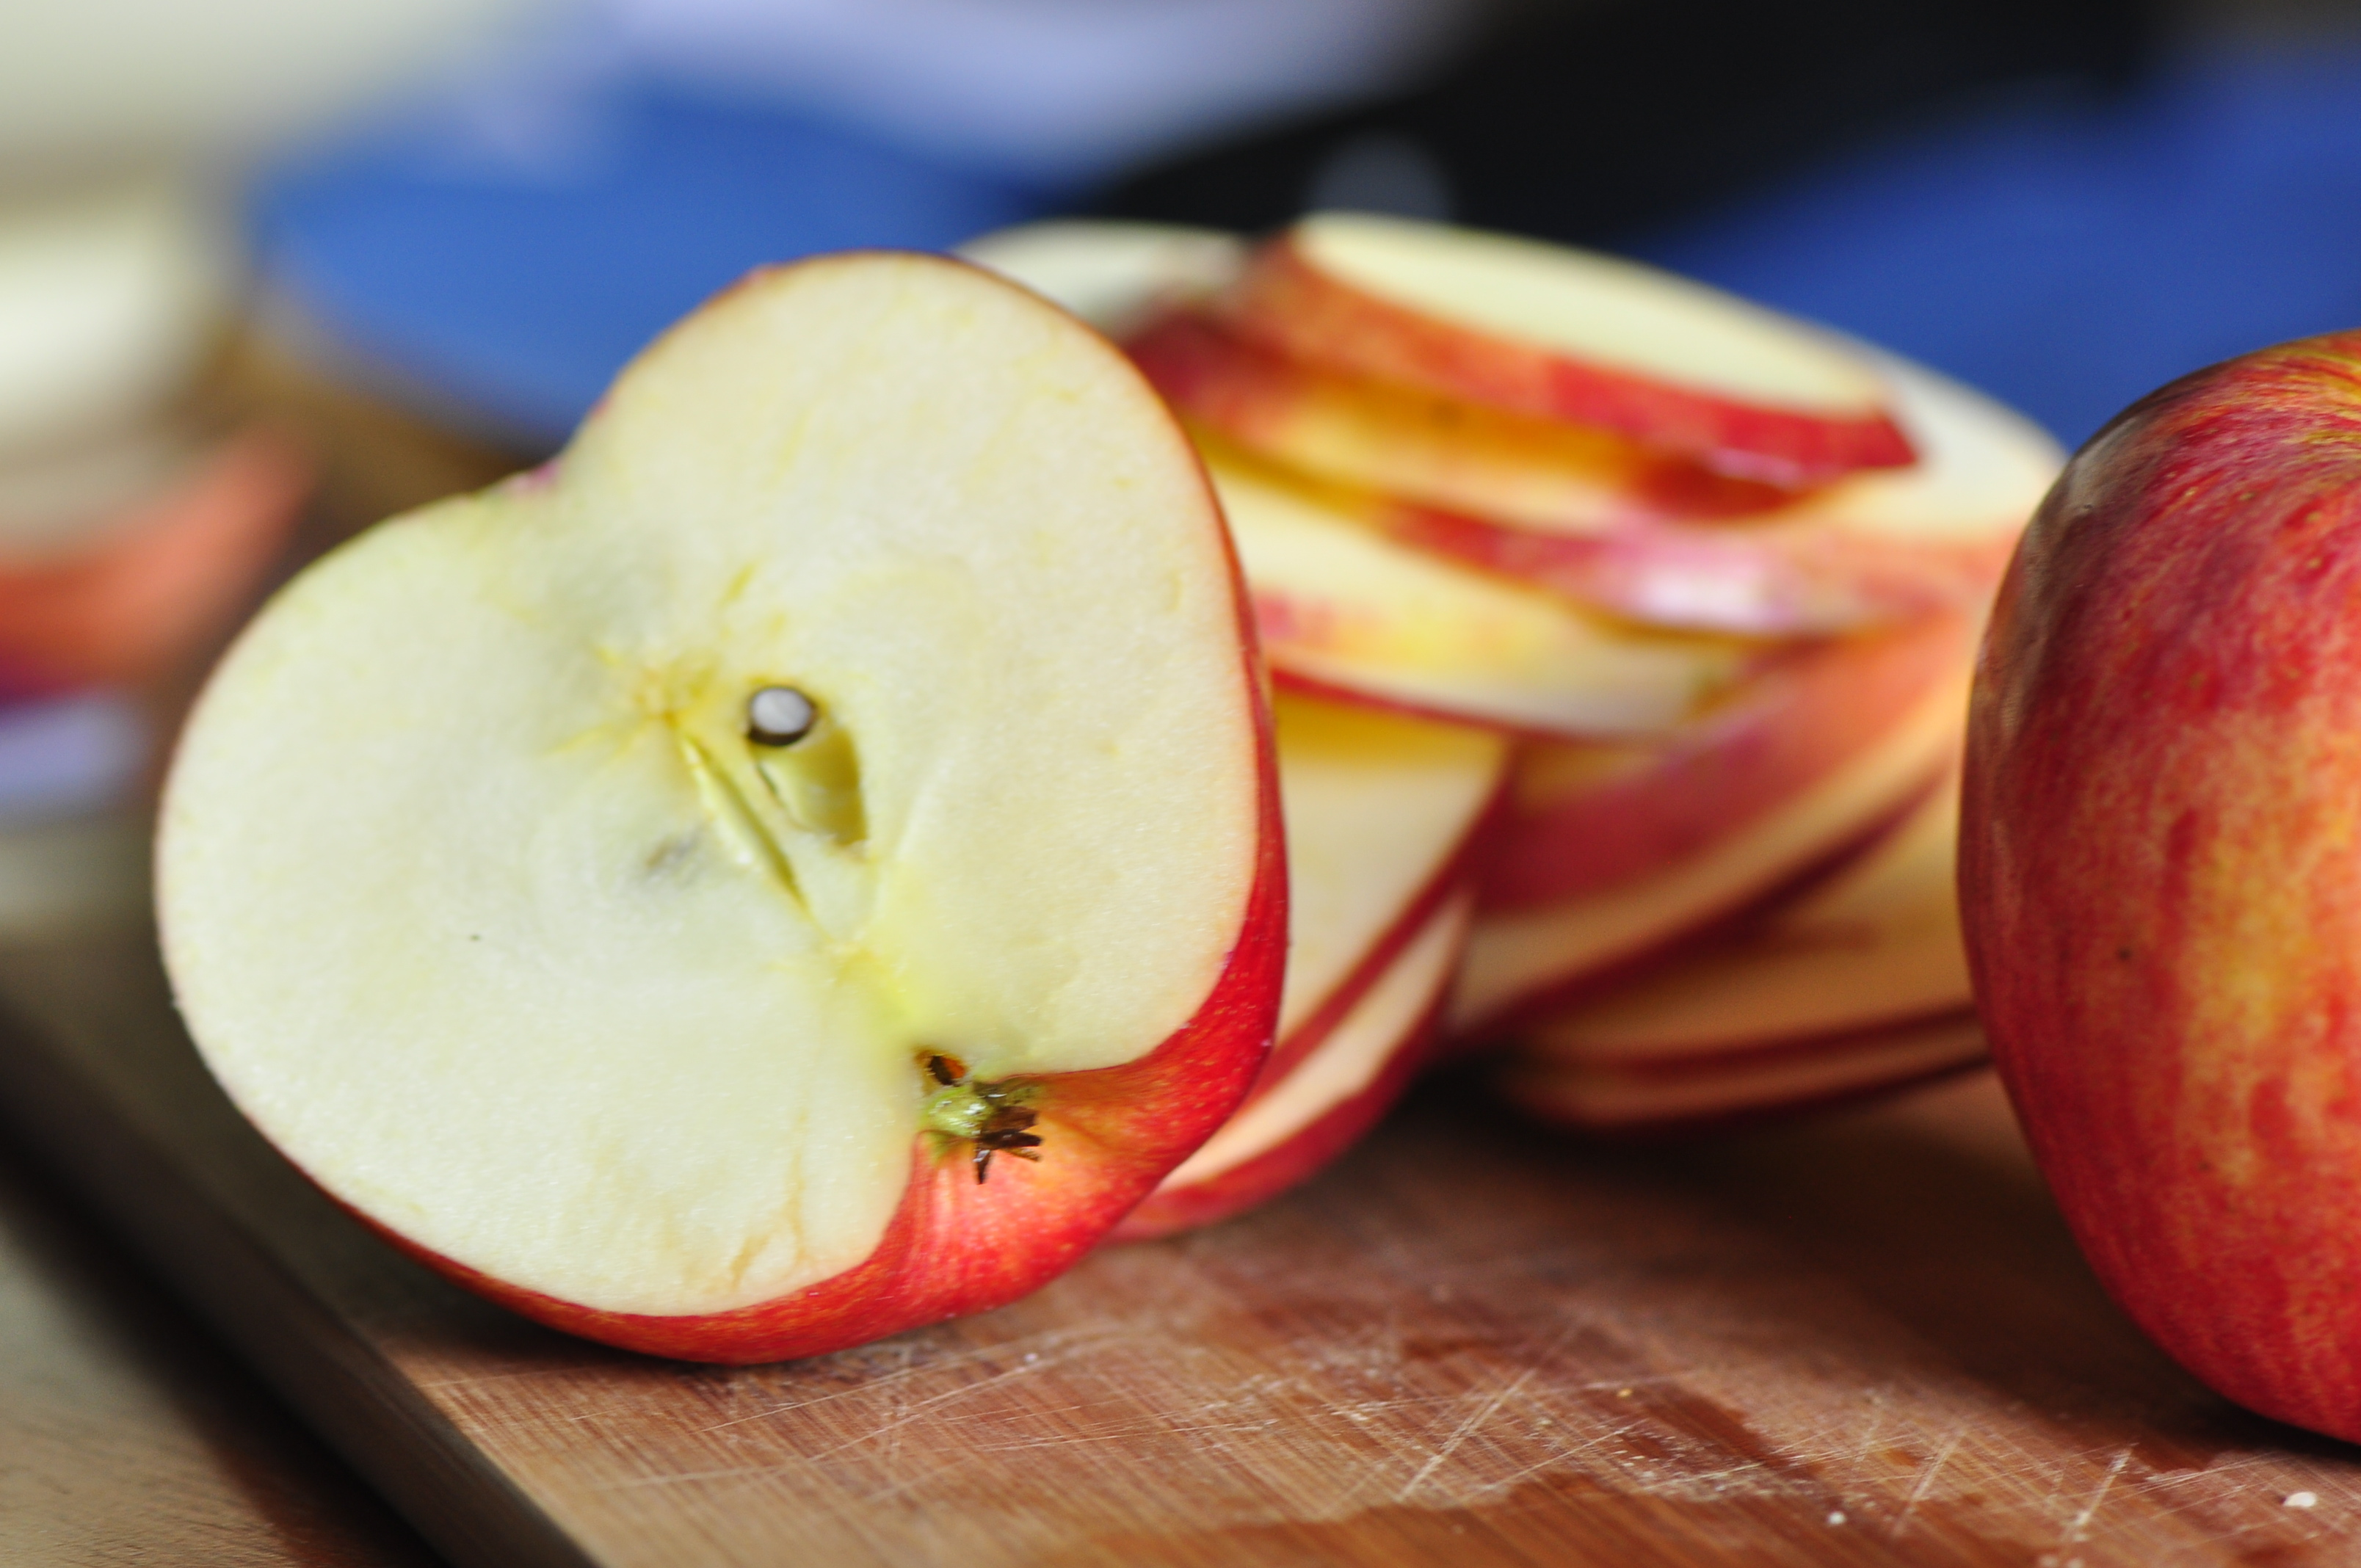 Baked Cinnamon Apple Chips The Vegetarian Ginger Watermelon Wallpaper Rainbow Find Free HD for Desktop [freshlhys.tk]